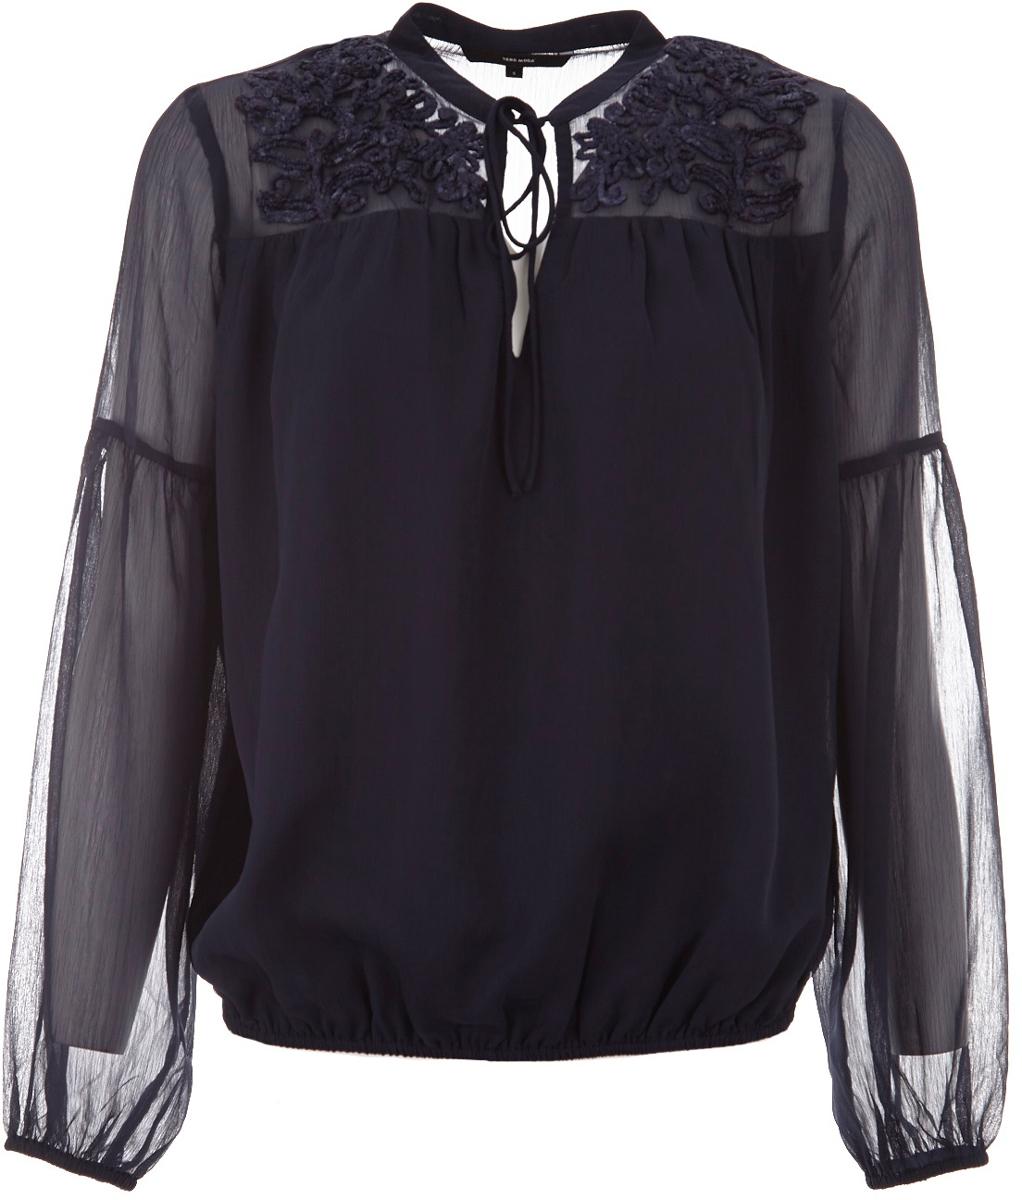 Блузка женская Vero Moda, цвет: темно-синий. 10185517_Navy Blazer. Размер XS (40/42) блузка женская vero moda цвет темно синий 10185884 navy blazer размер xs 40 42